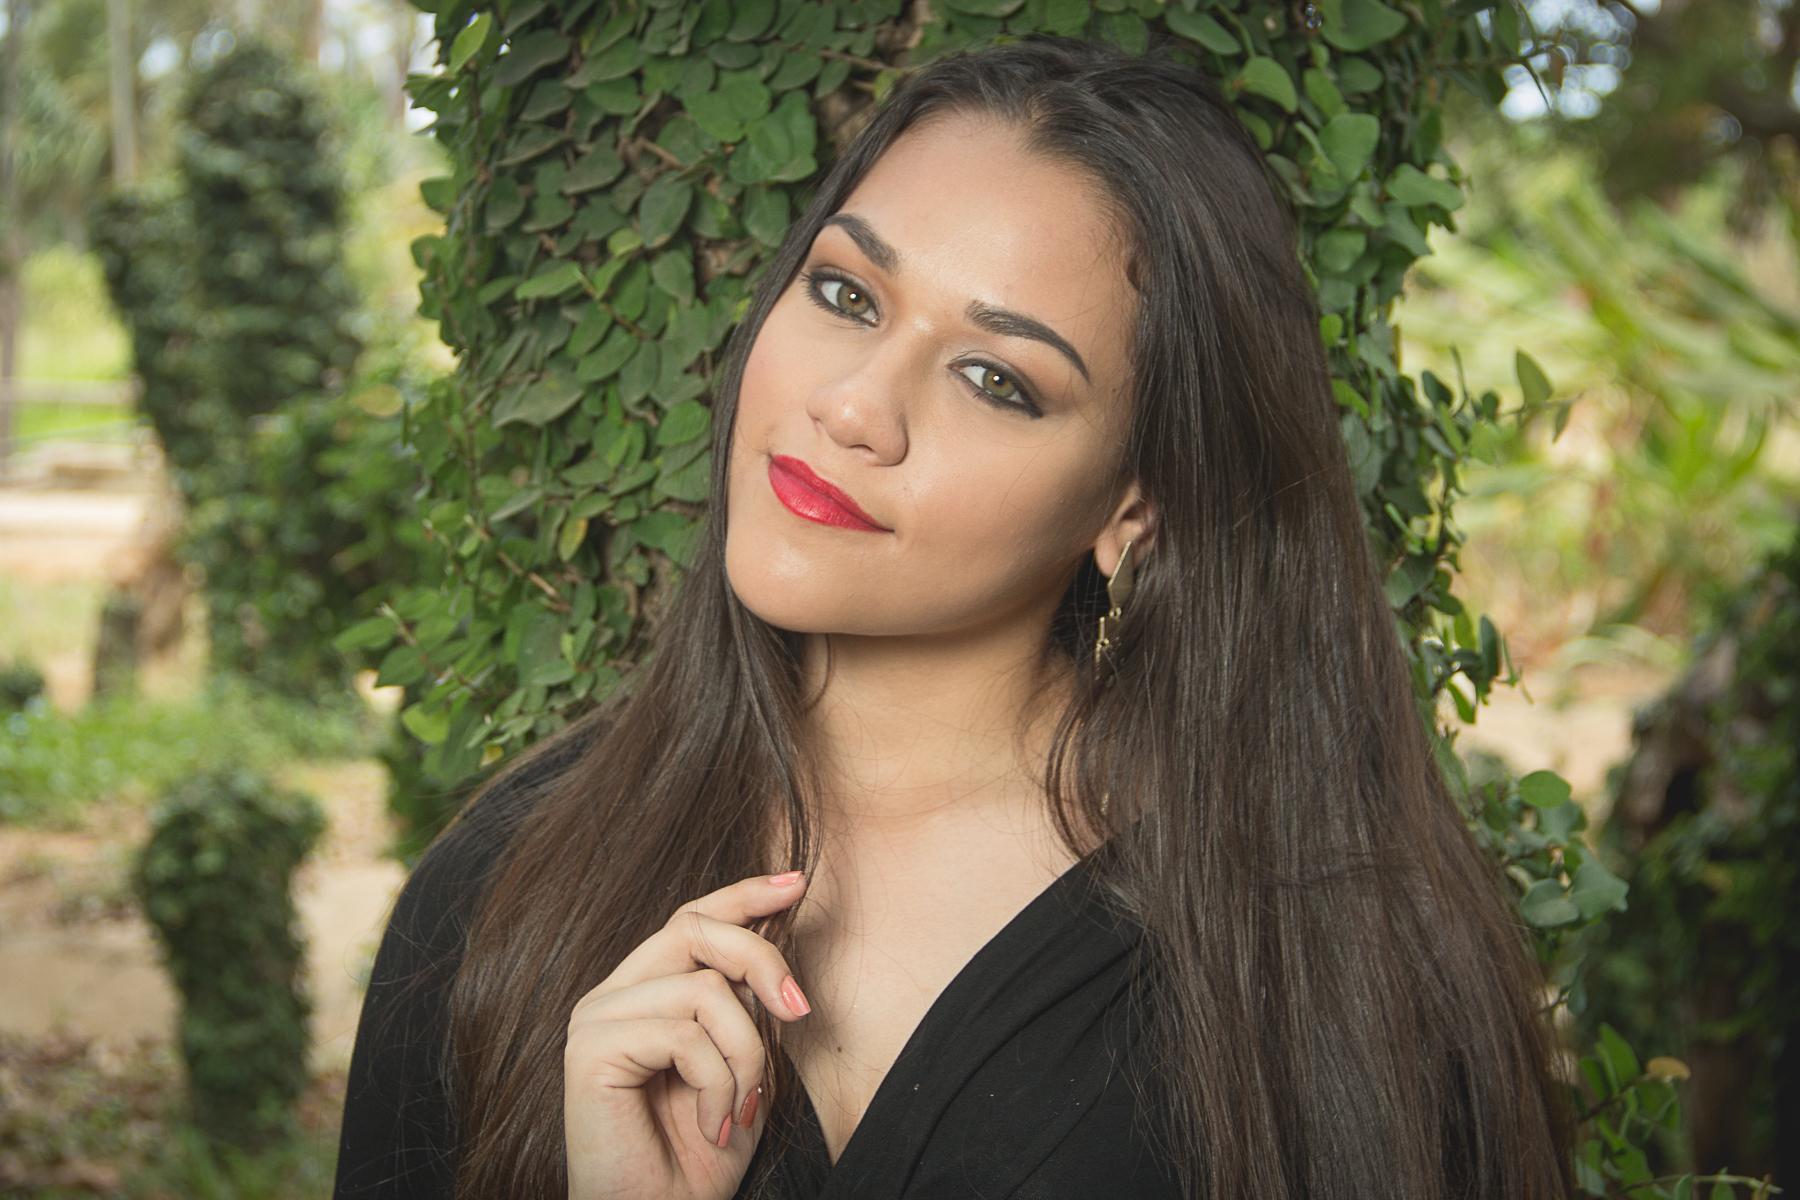 Orianna Tancredi